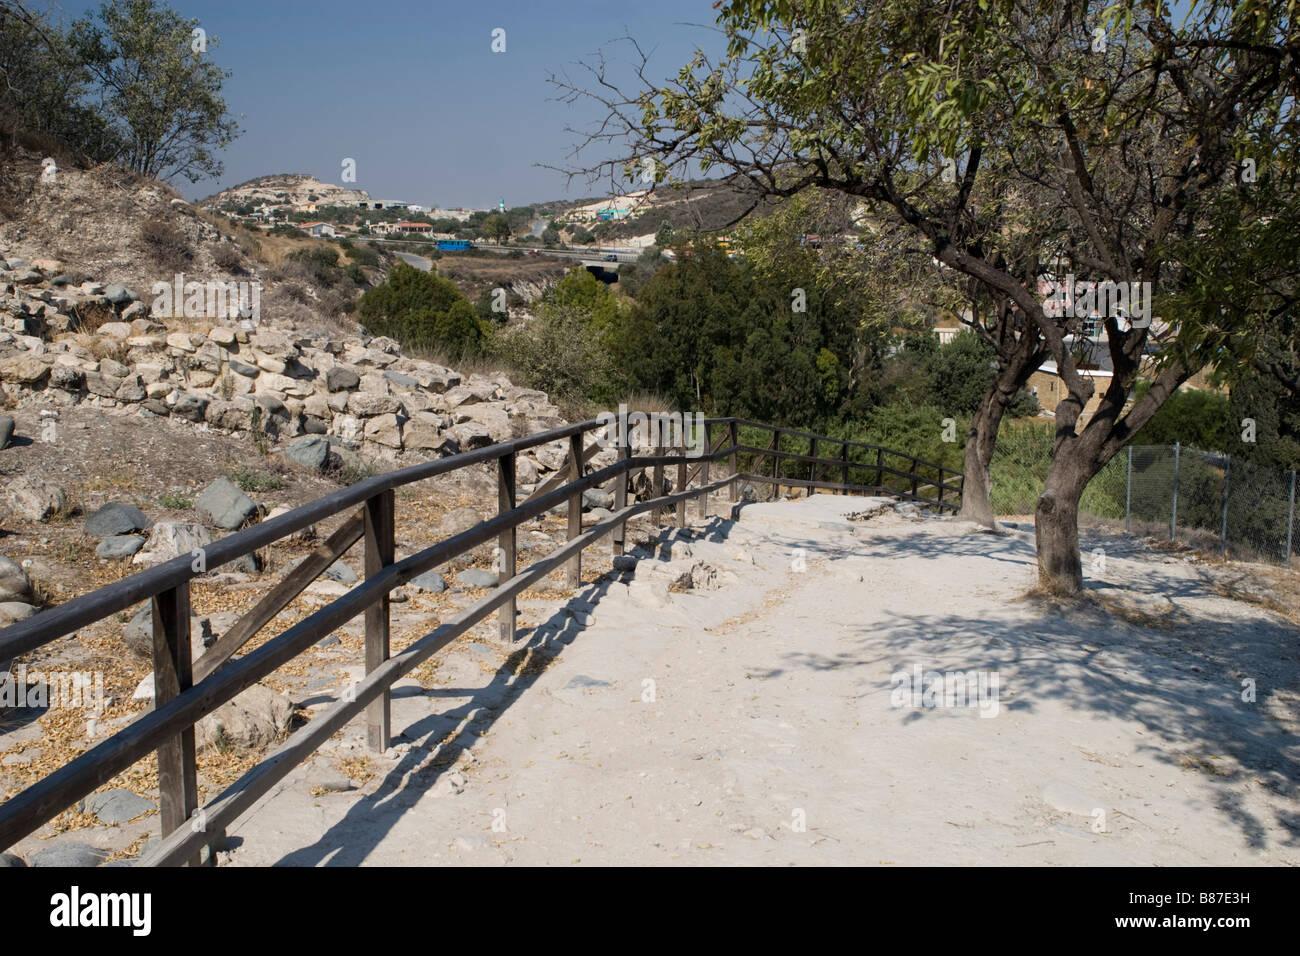 UNESCO World Heritage Site view of  Choirokoitia settlement excavation area . South Cyprus. Stock Photo